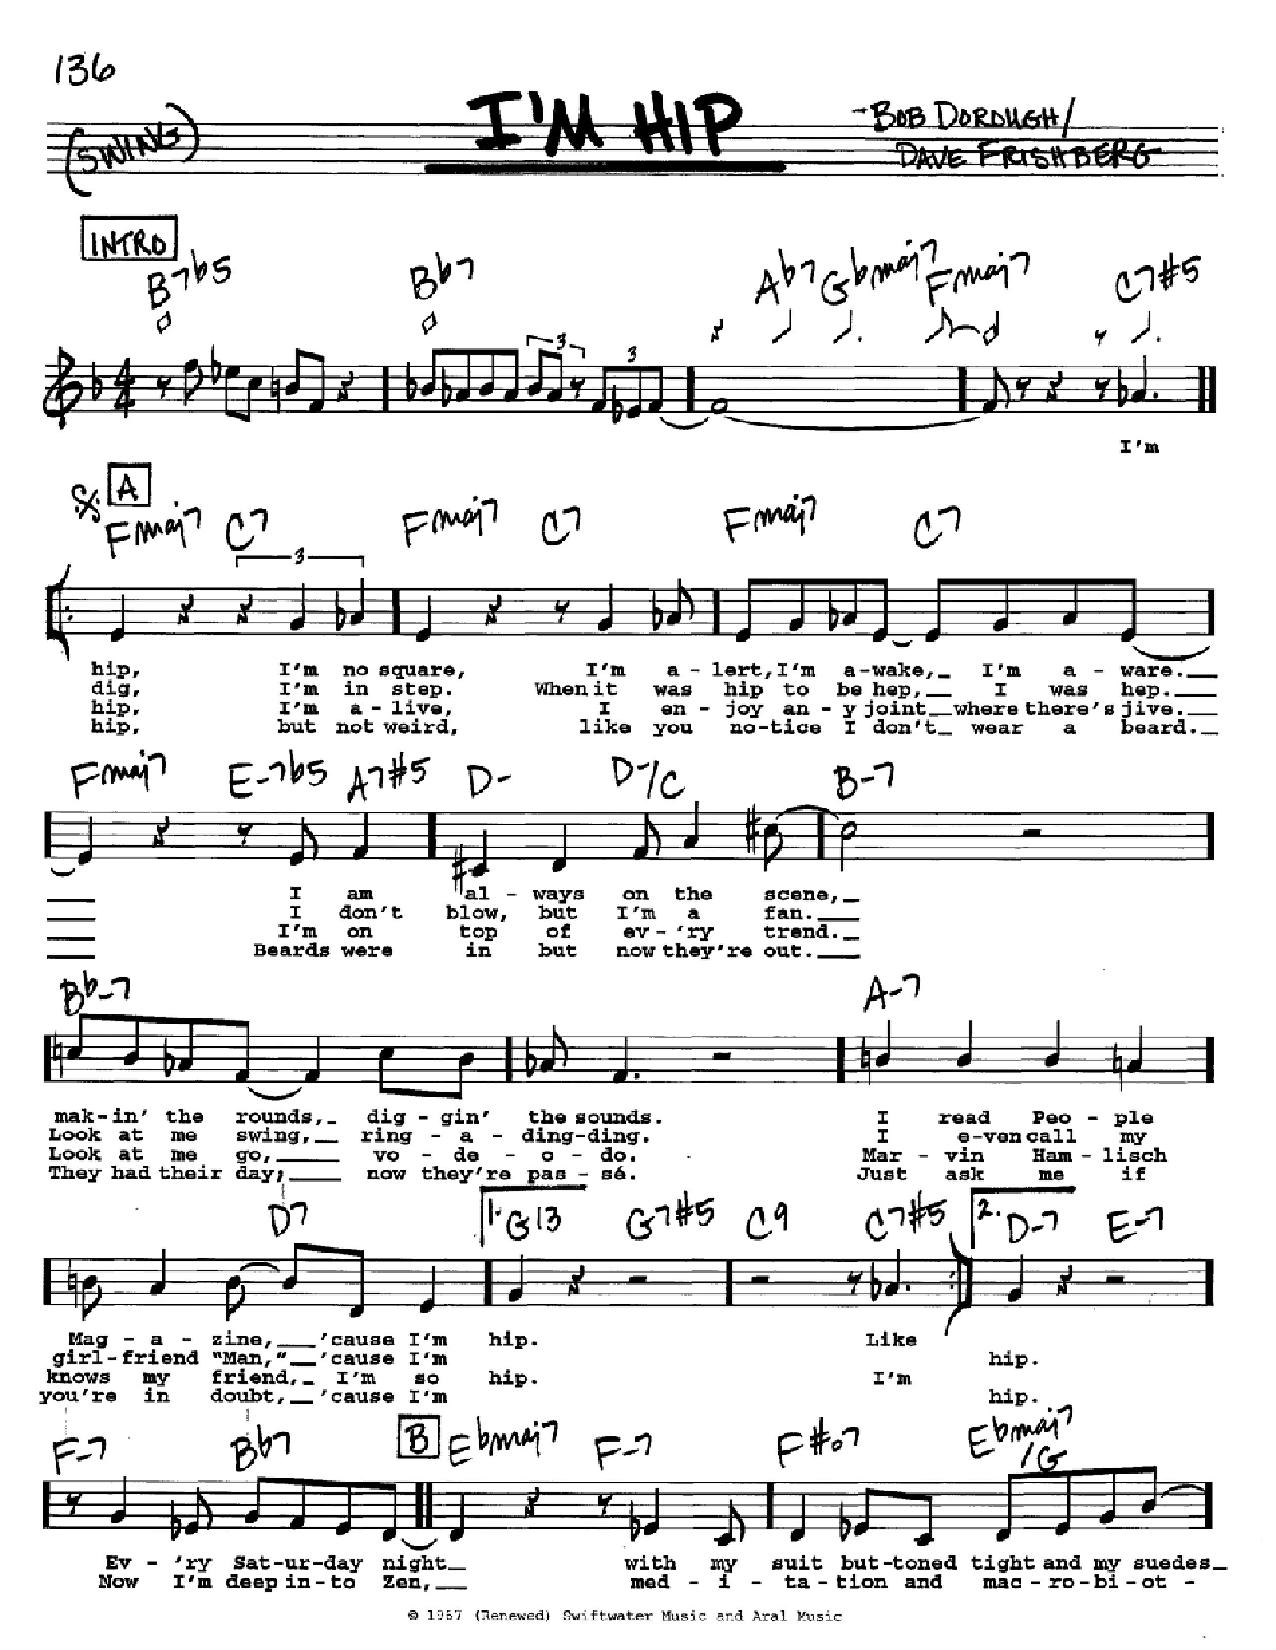 jdd adventure sheet music pdf